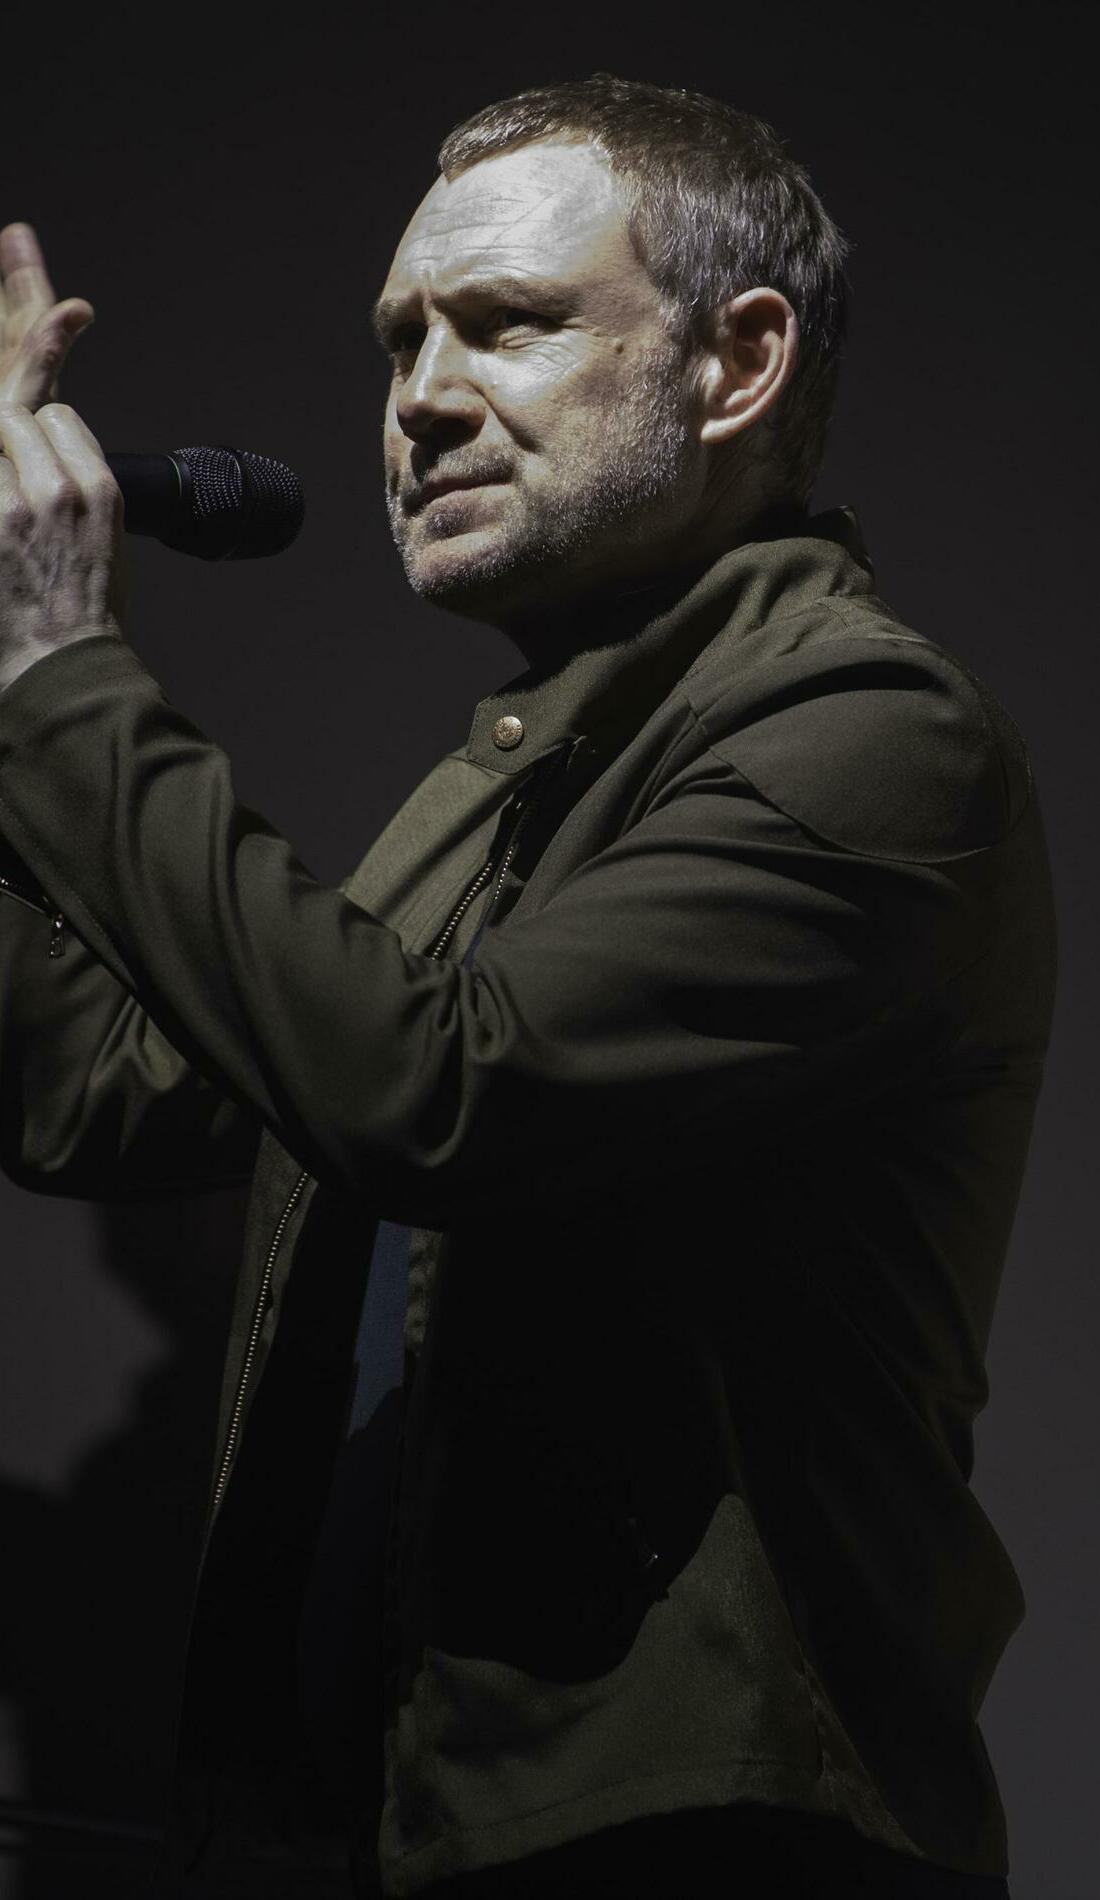 A David Gray live event